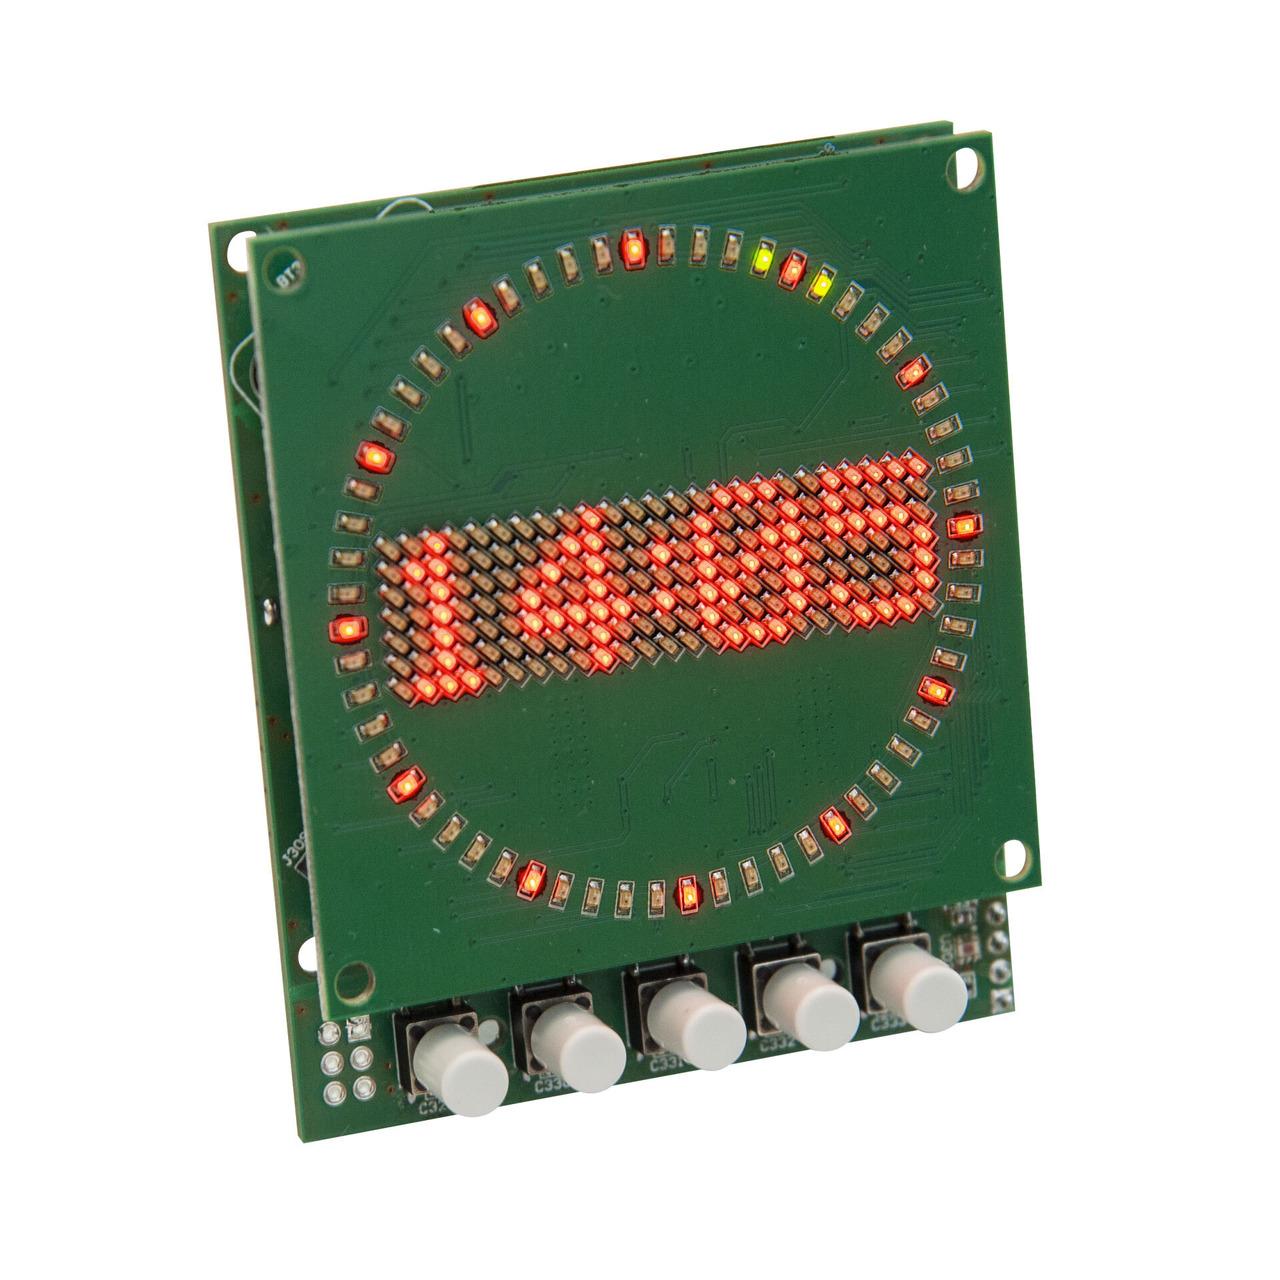 ELV Bausatz Mini-Kreis-LED-Uhr MKLU1